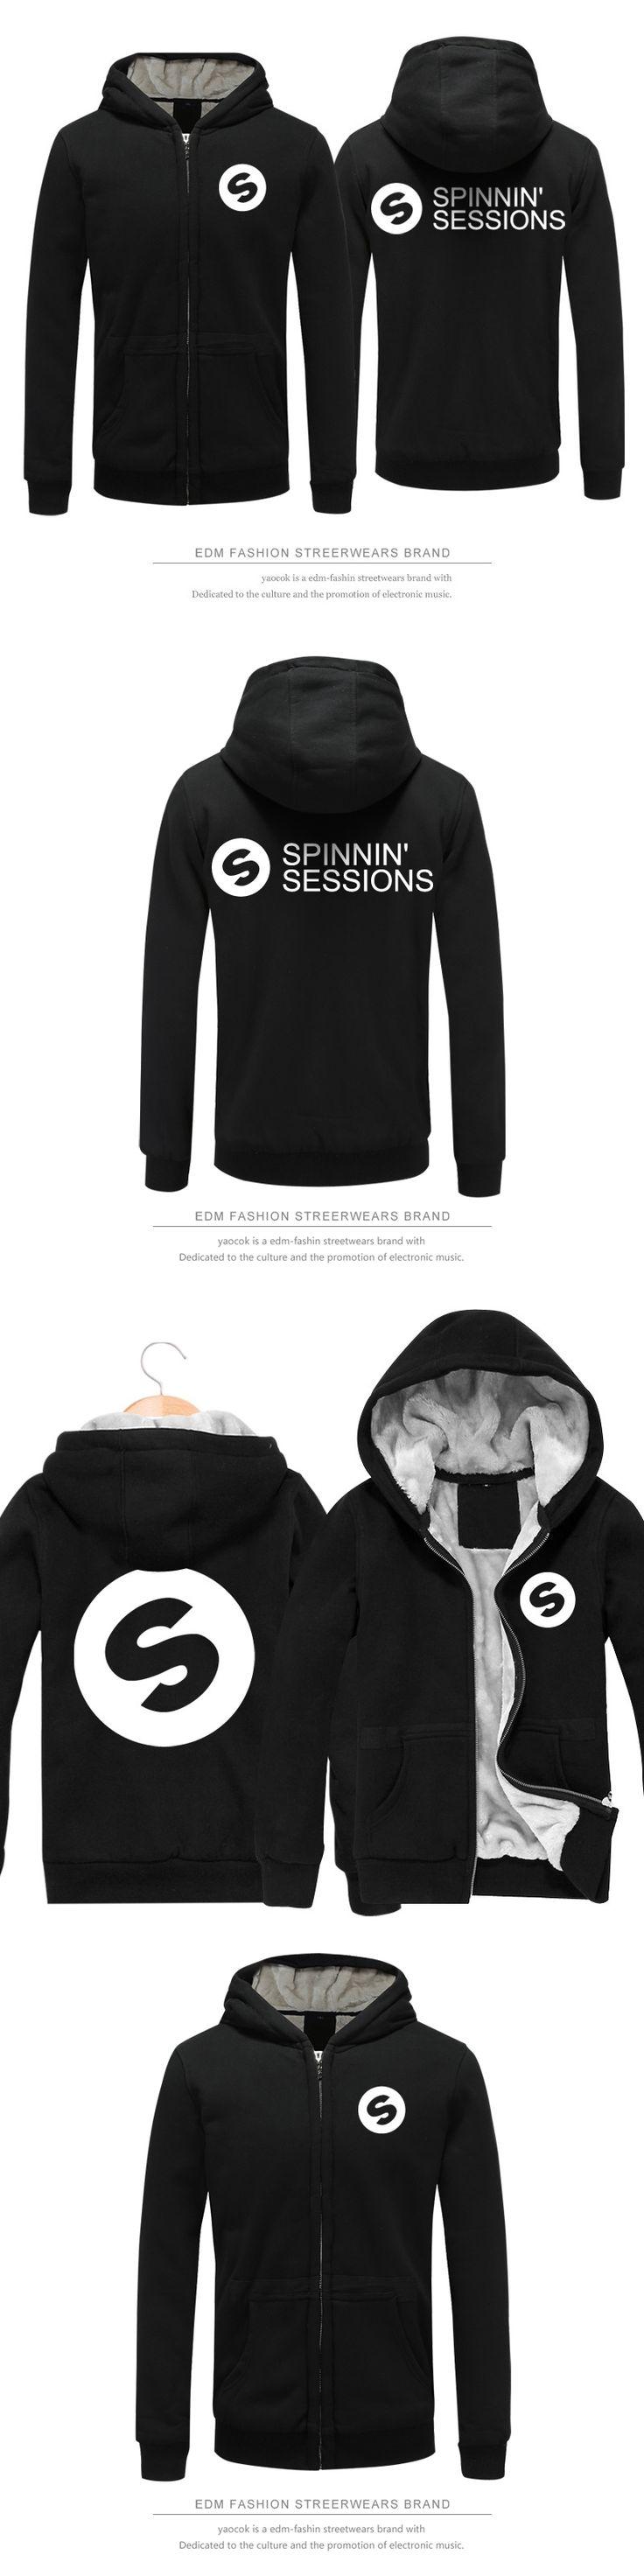 2017 Spinnin Records Series Winter Hoodies Clothes Zipper Cap Hoodies Men/Women Thick Warm Sweatshirt Plus Size DIY Printing